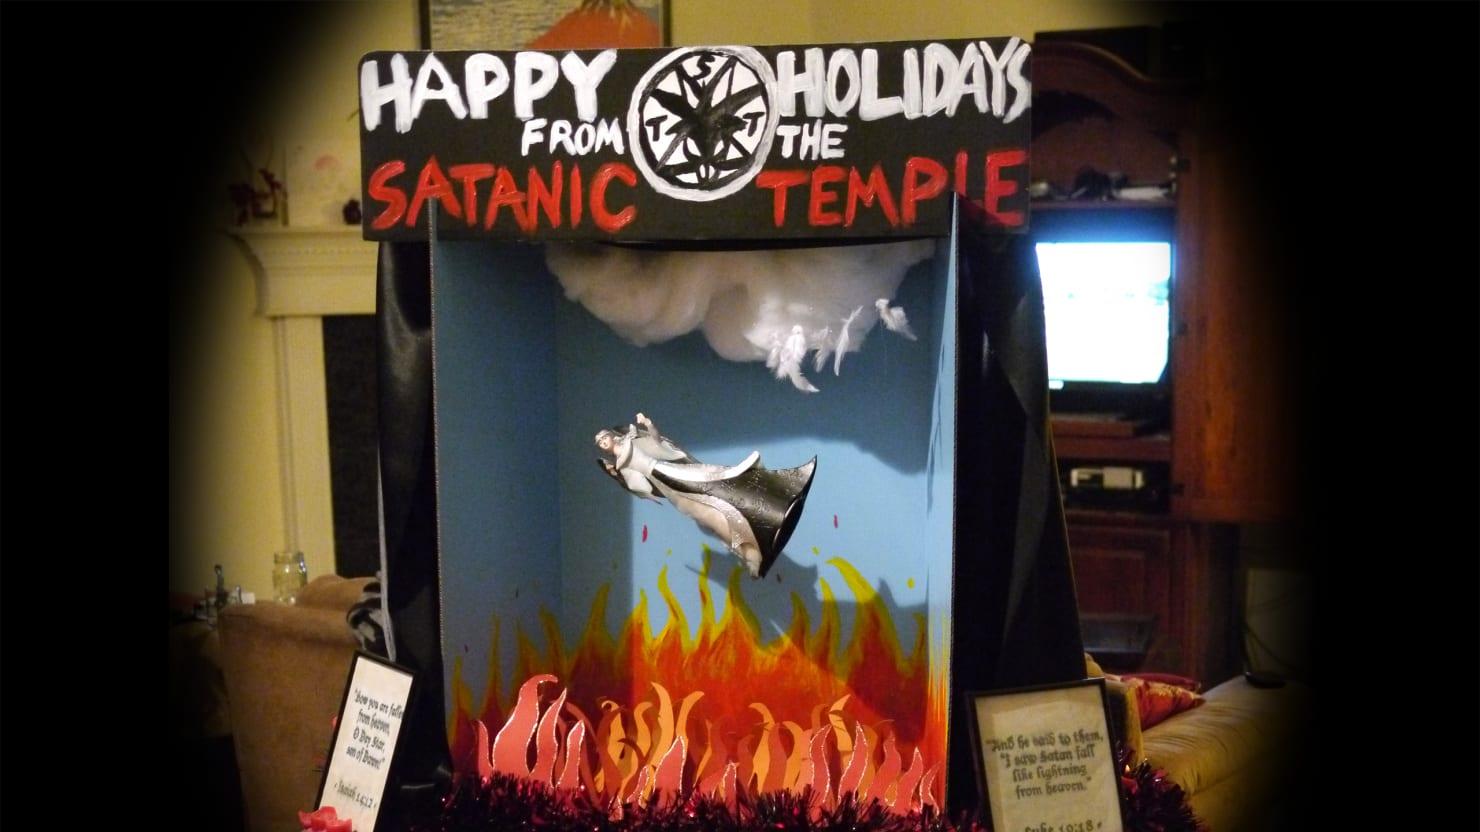 In Florida, 'Tis The Season for Satan